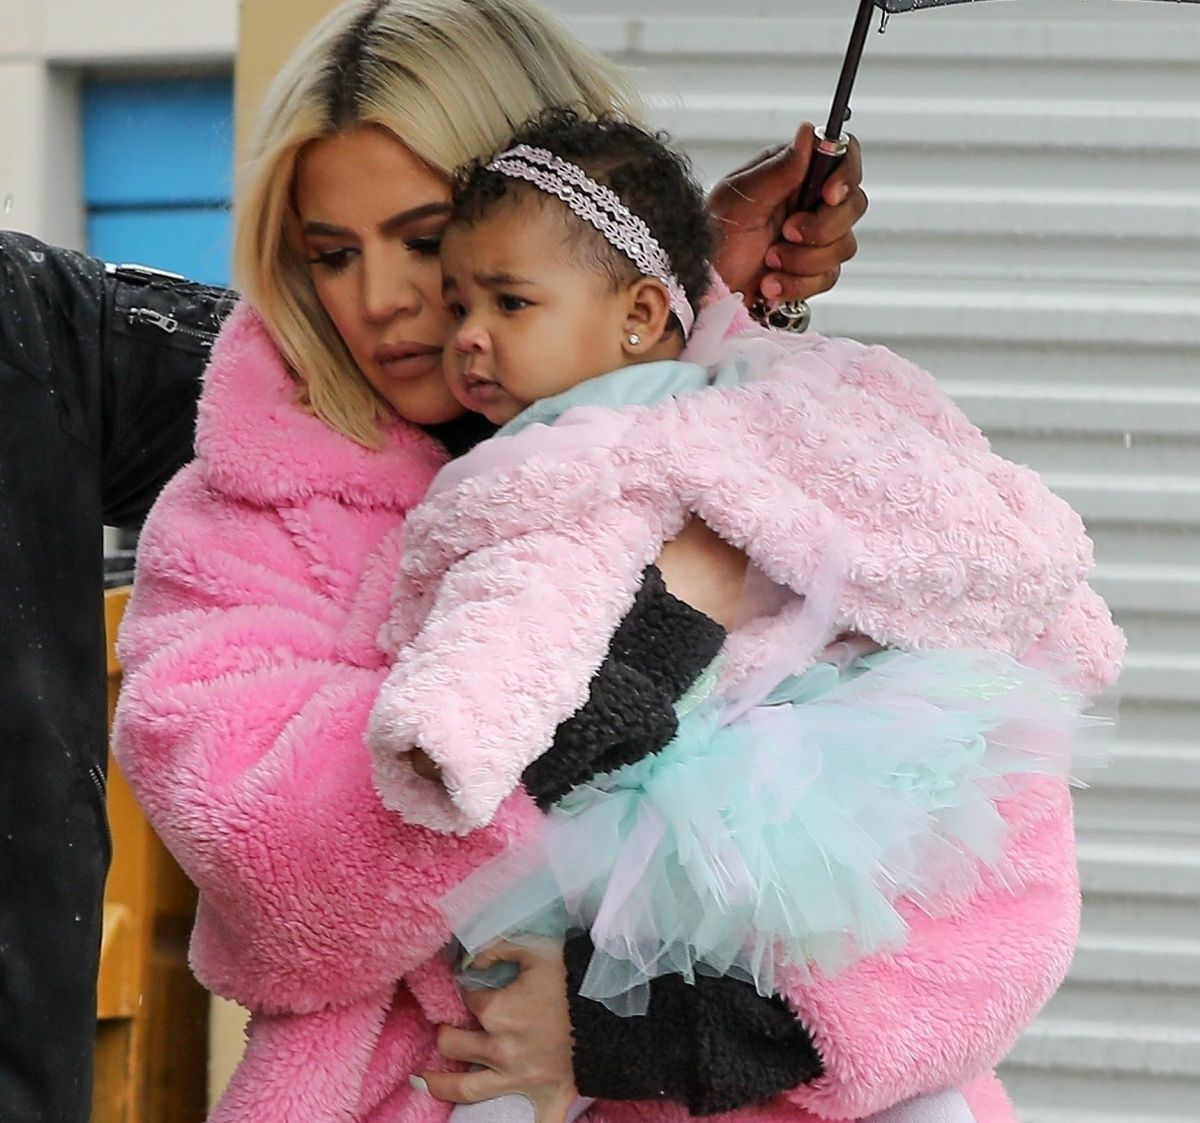 Tristan Thompson le presume su nuevo amor a Khloé Kardashian: Karizma Ramirez, una sexy morenaza